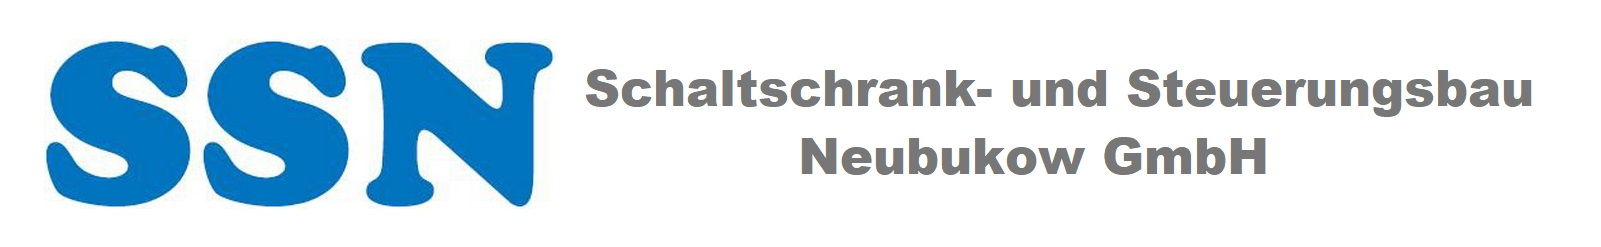 SSN GmbH